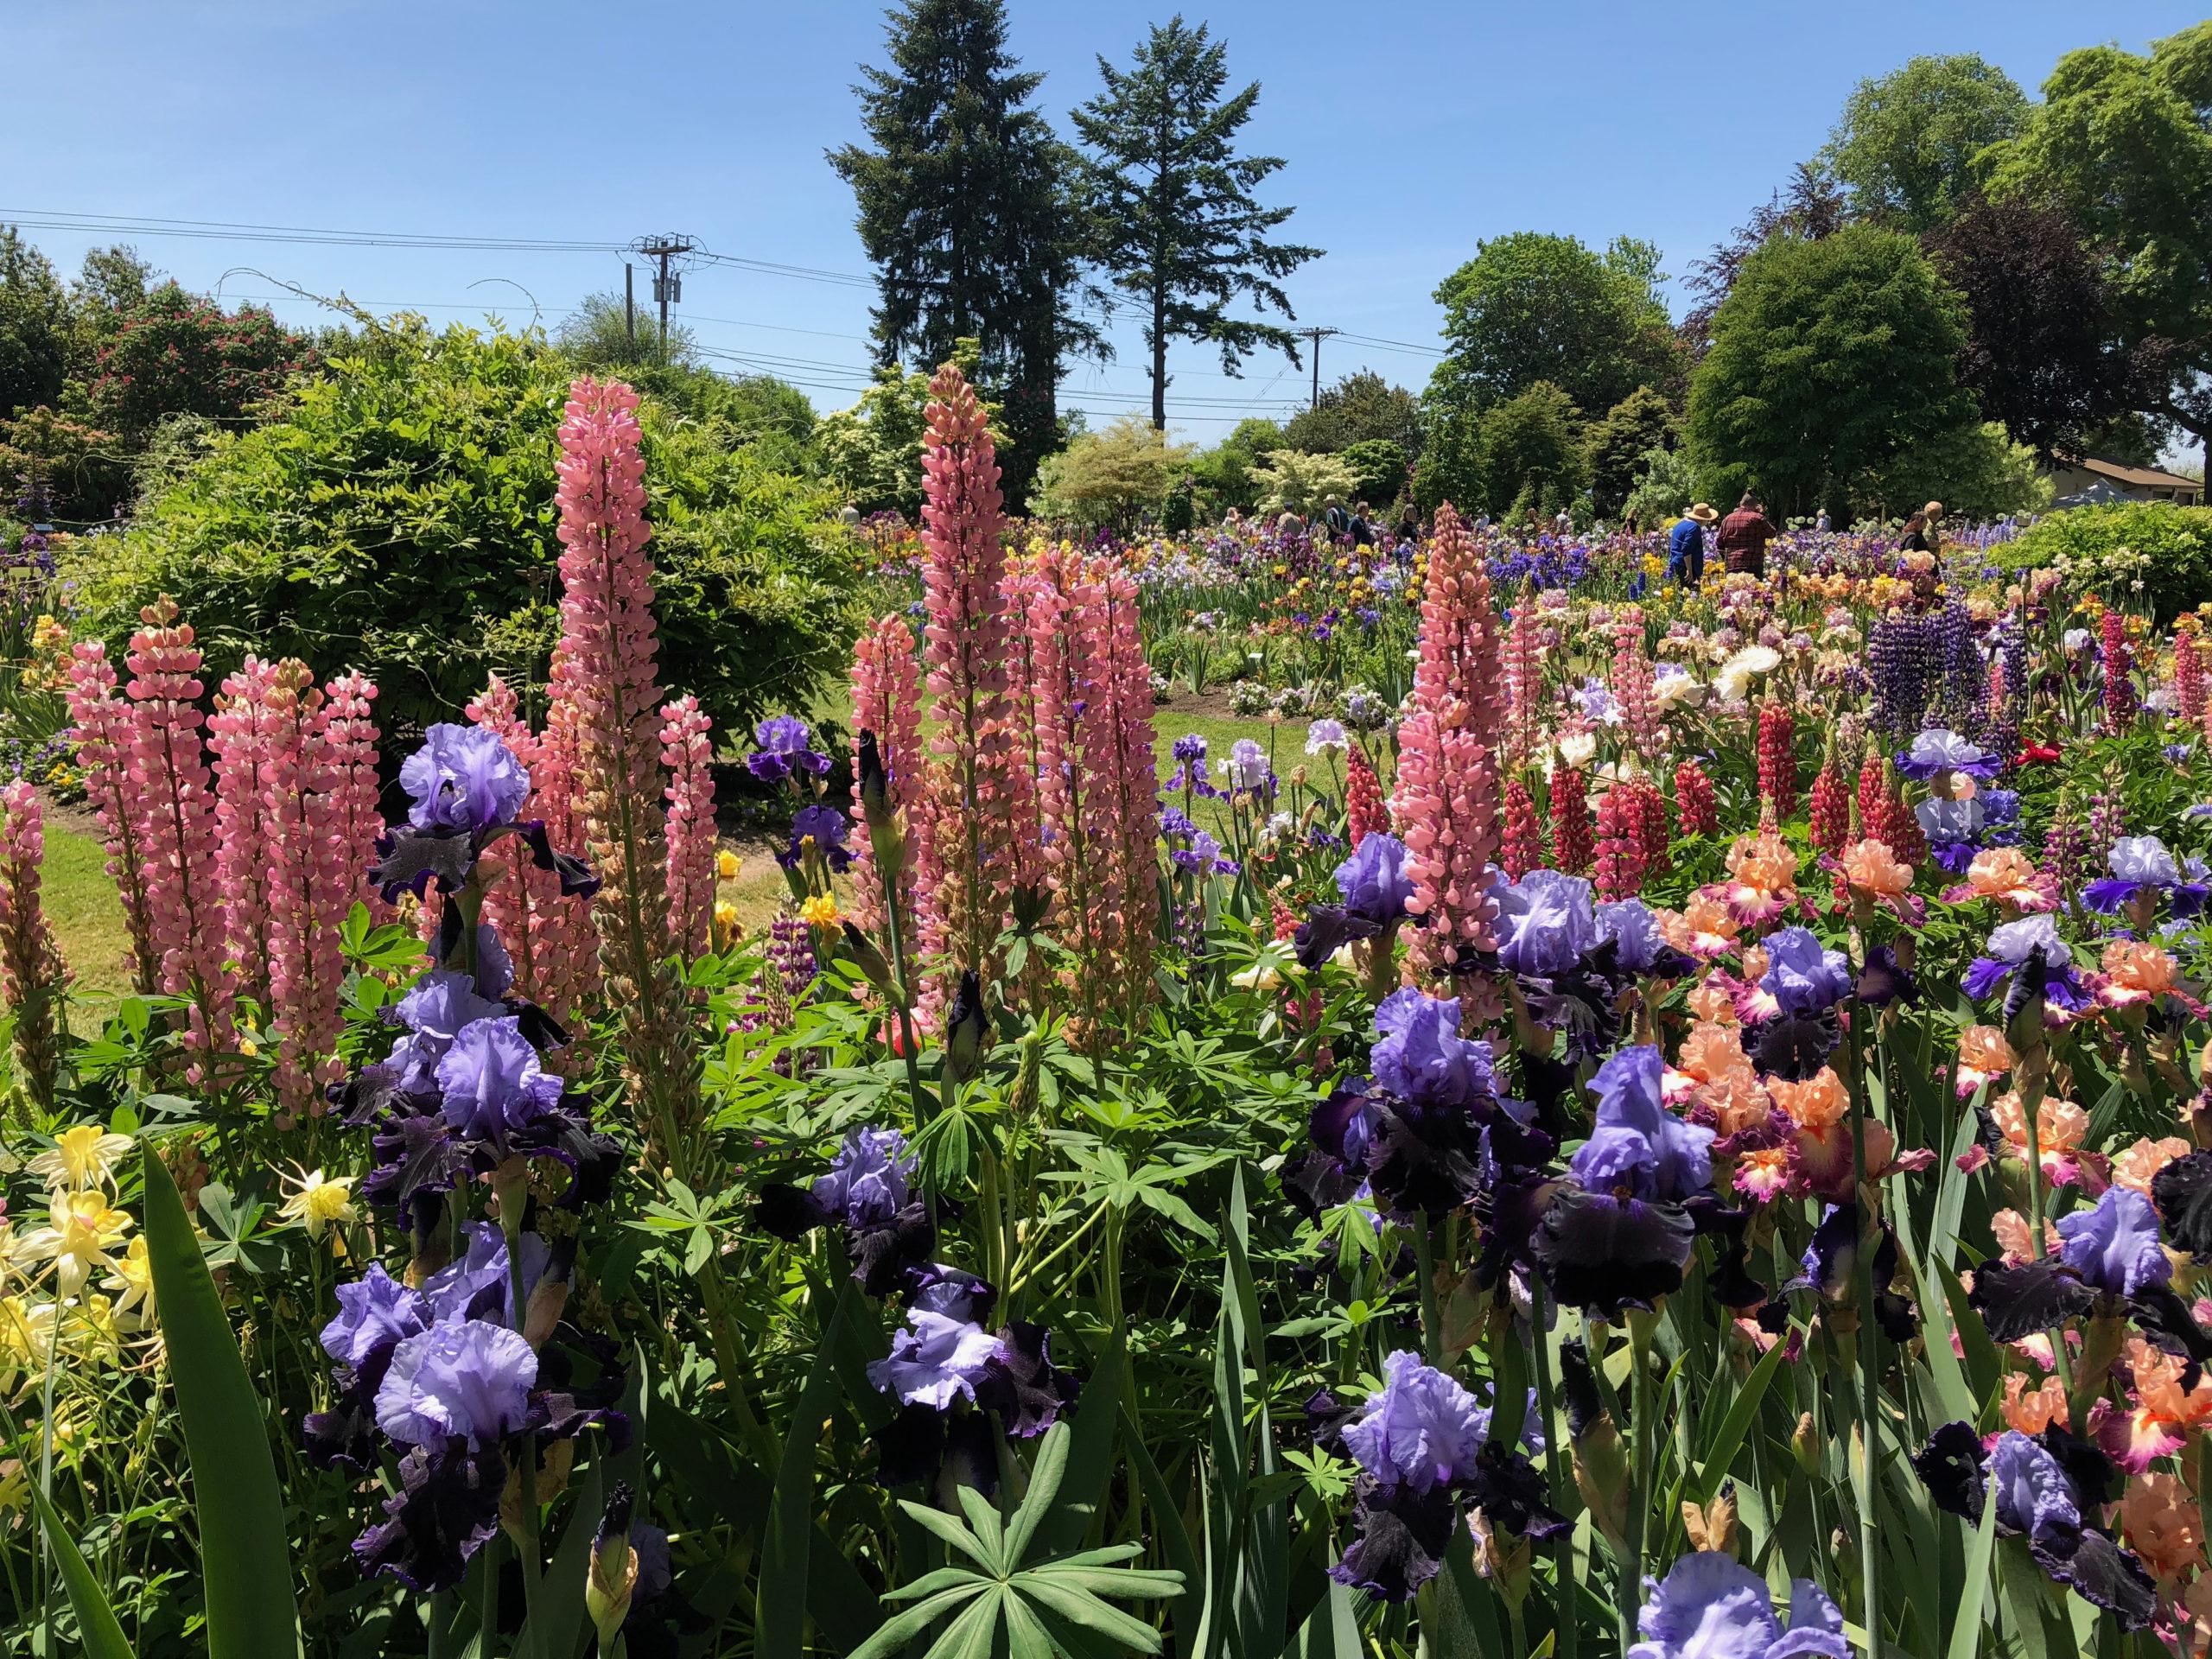 Schreiner Iris Gardens with large mauve and purple irises